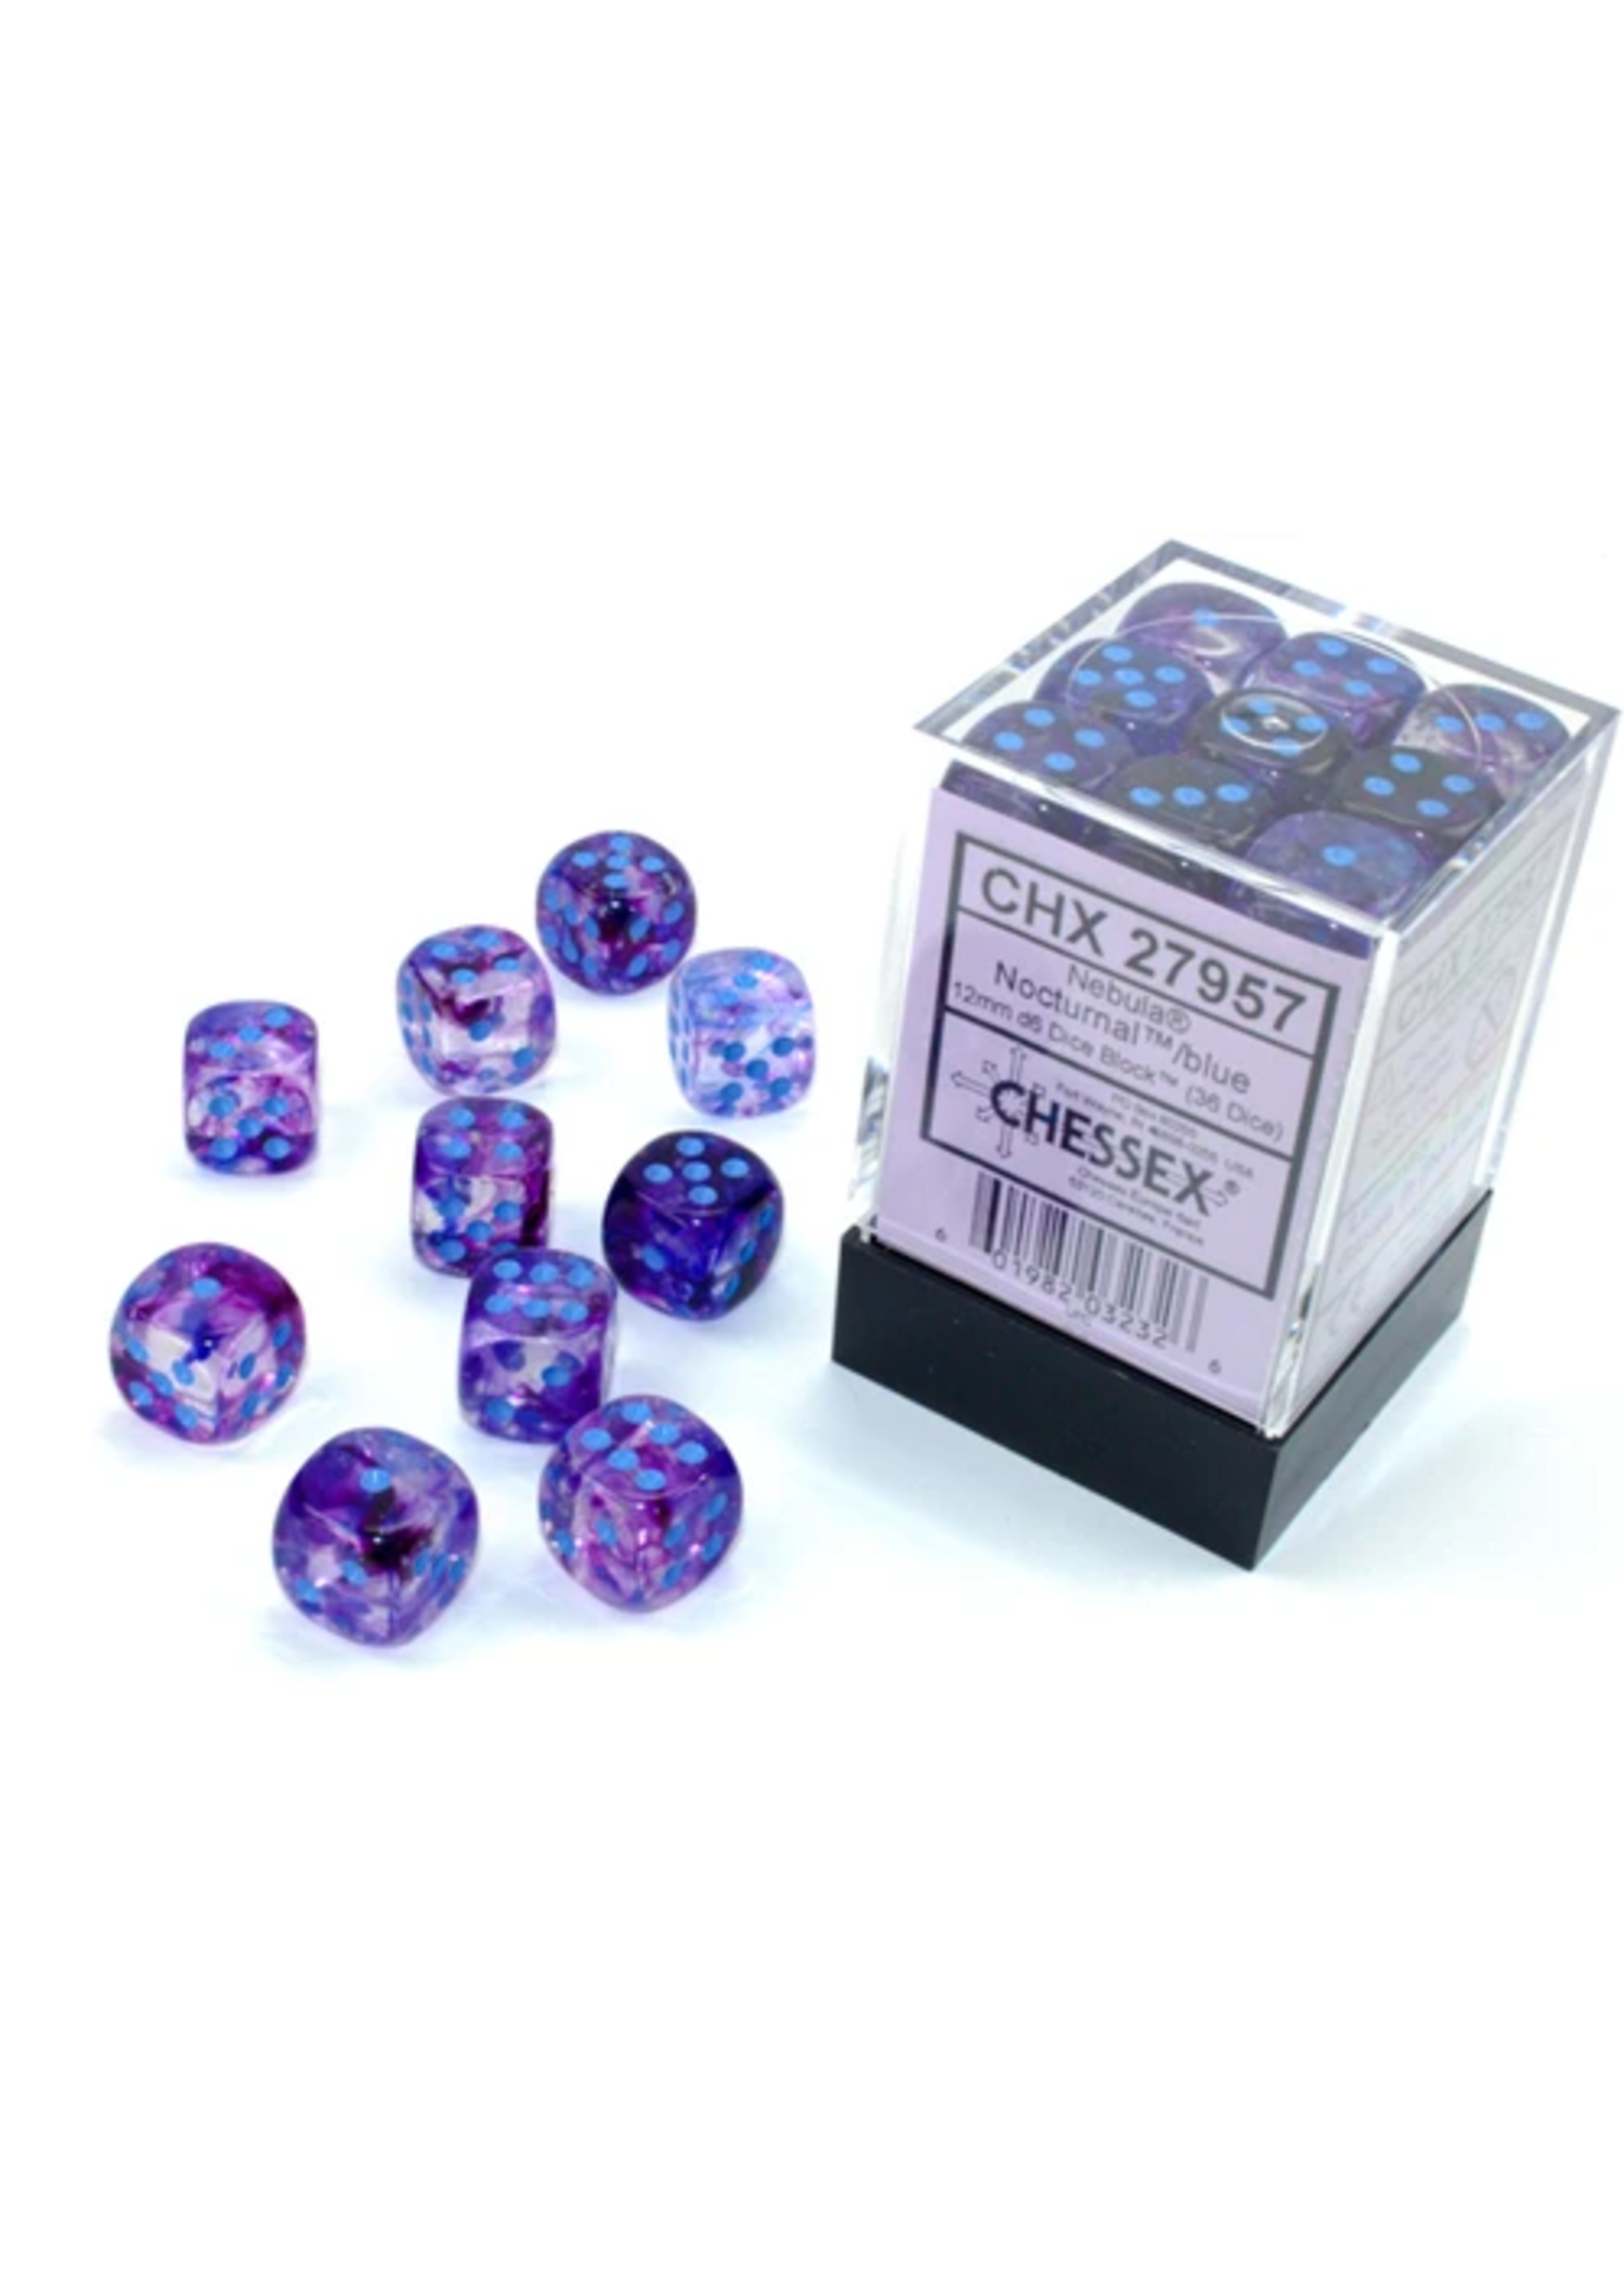 Chessex 12mm d6 Blocks - Nebula TM 12mm d6 Nocturnal/blue Luminary Dice Block™ (36 dice)